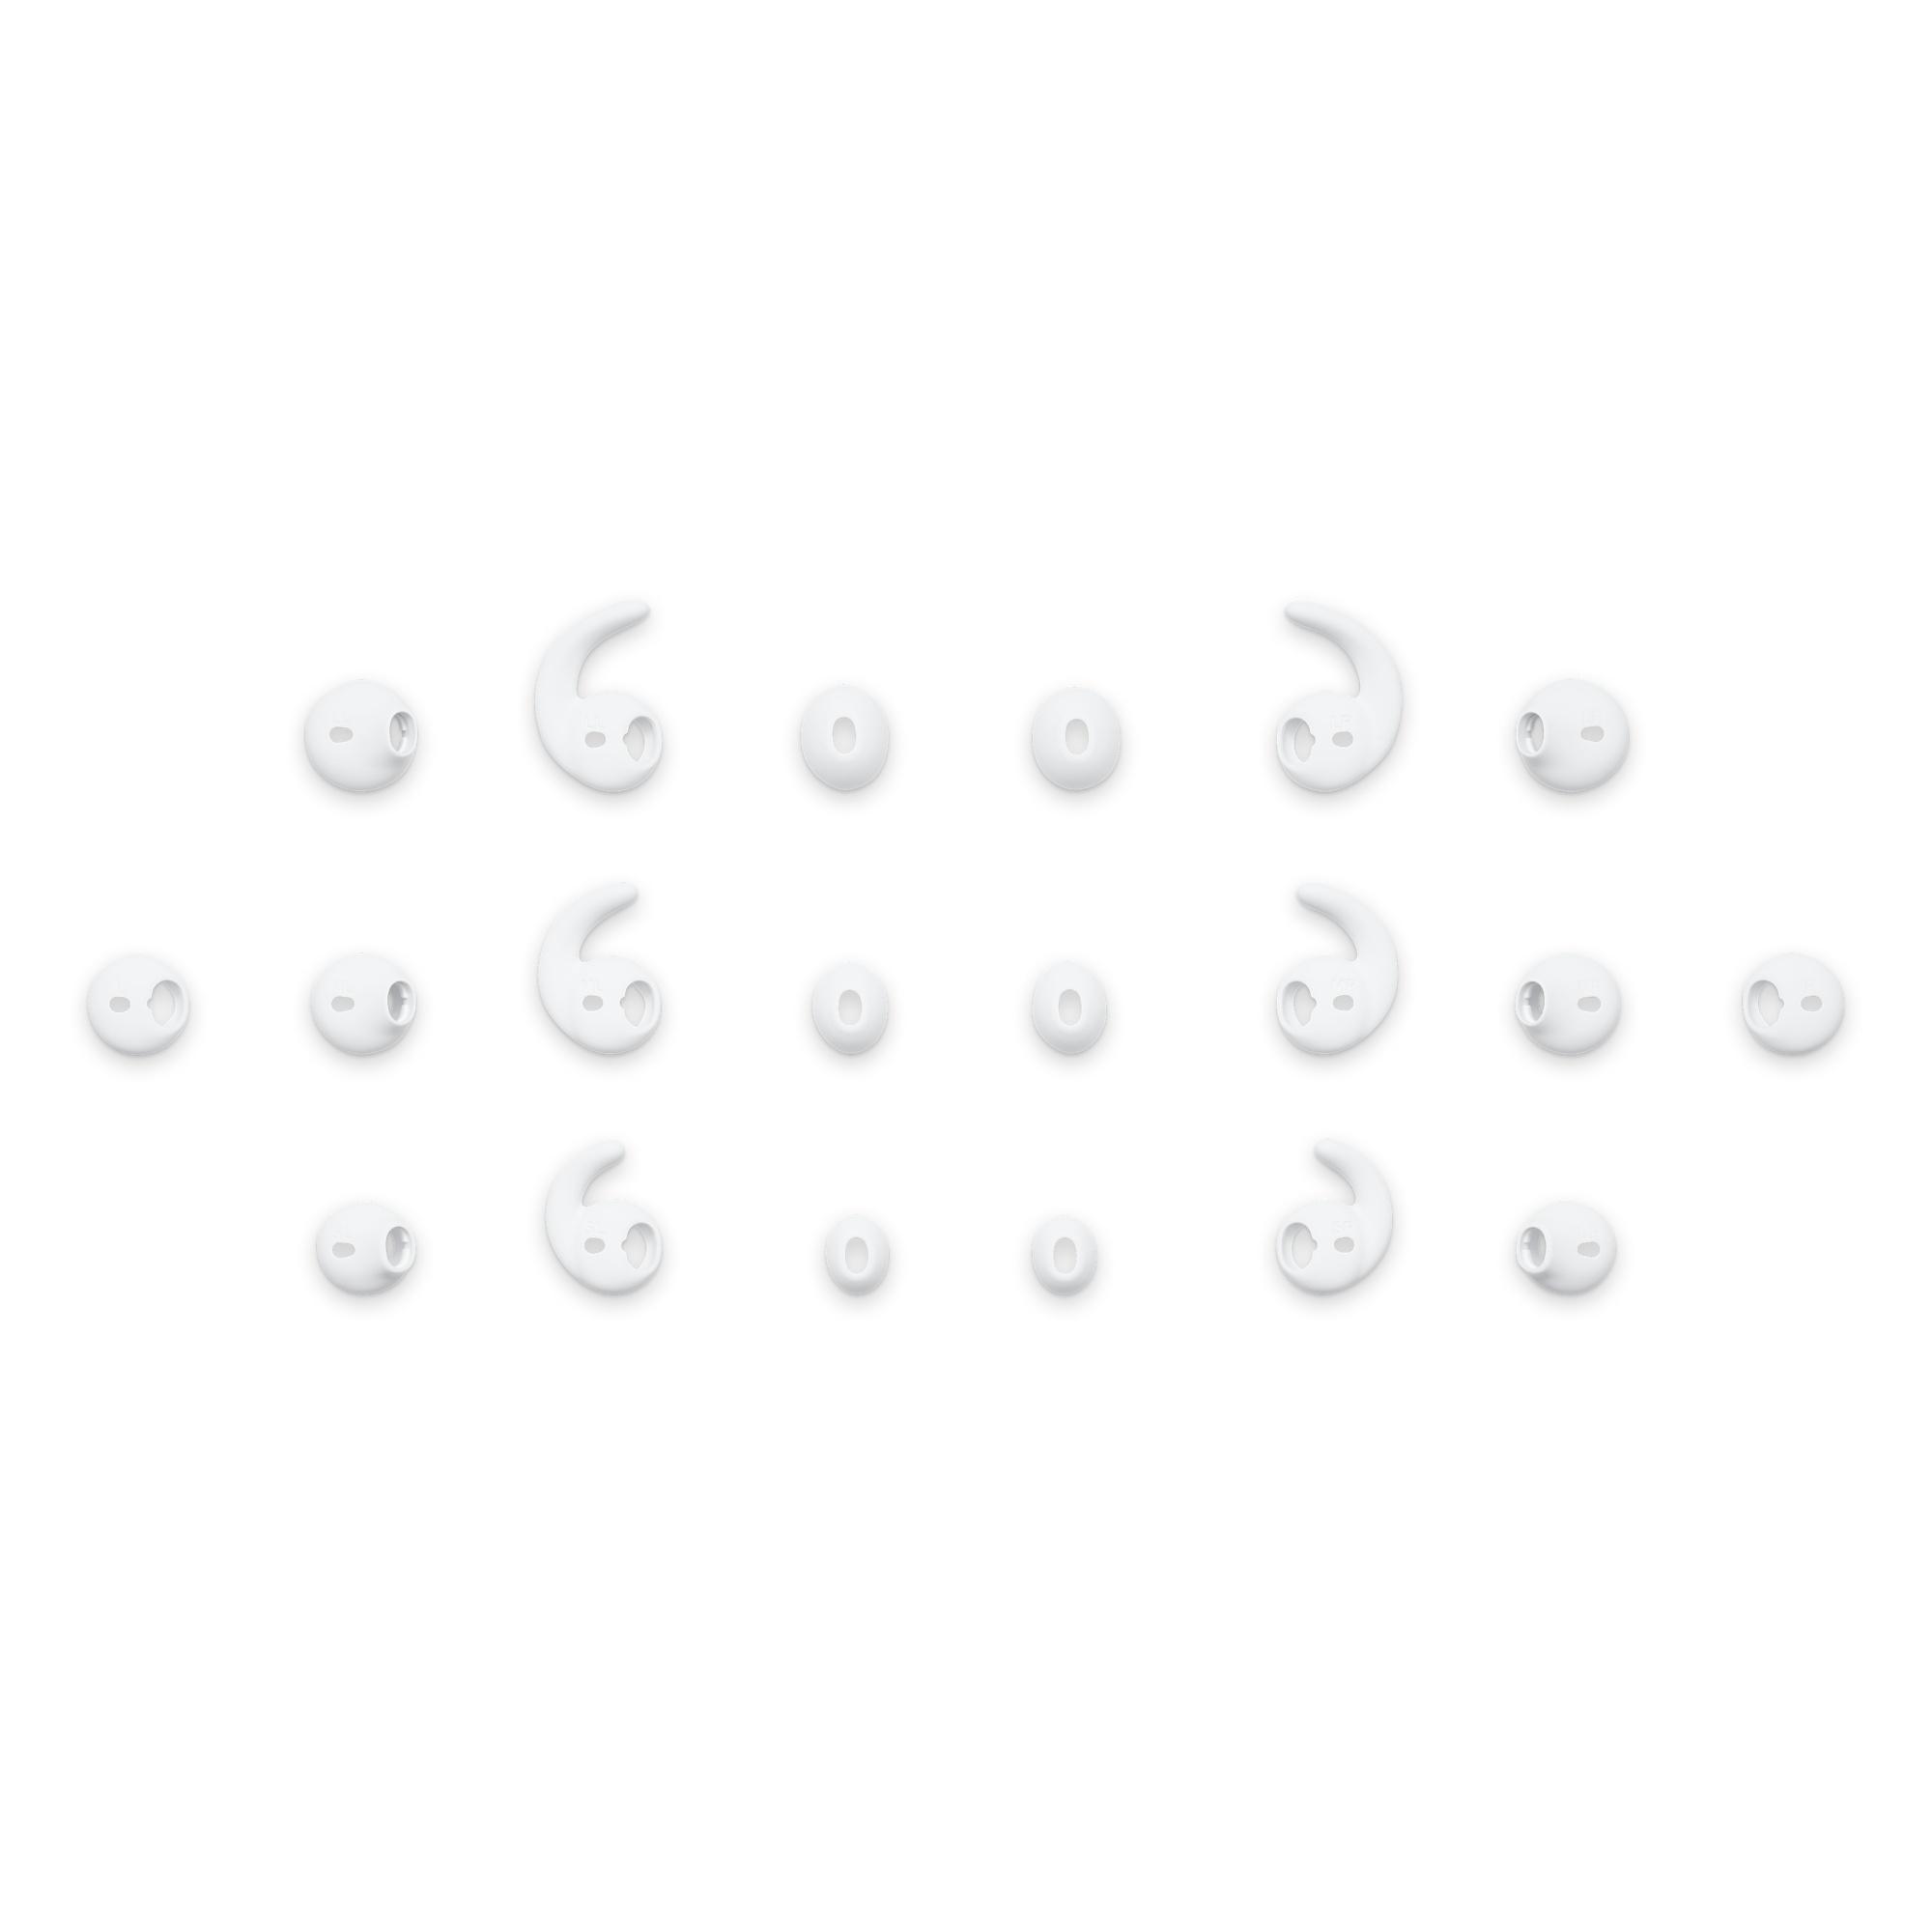 i-am-buttons-wireless-earphones-earpieces